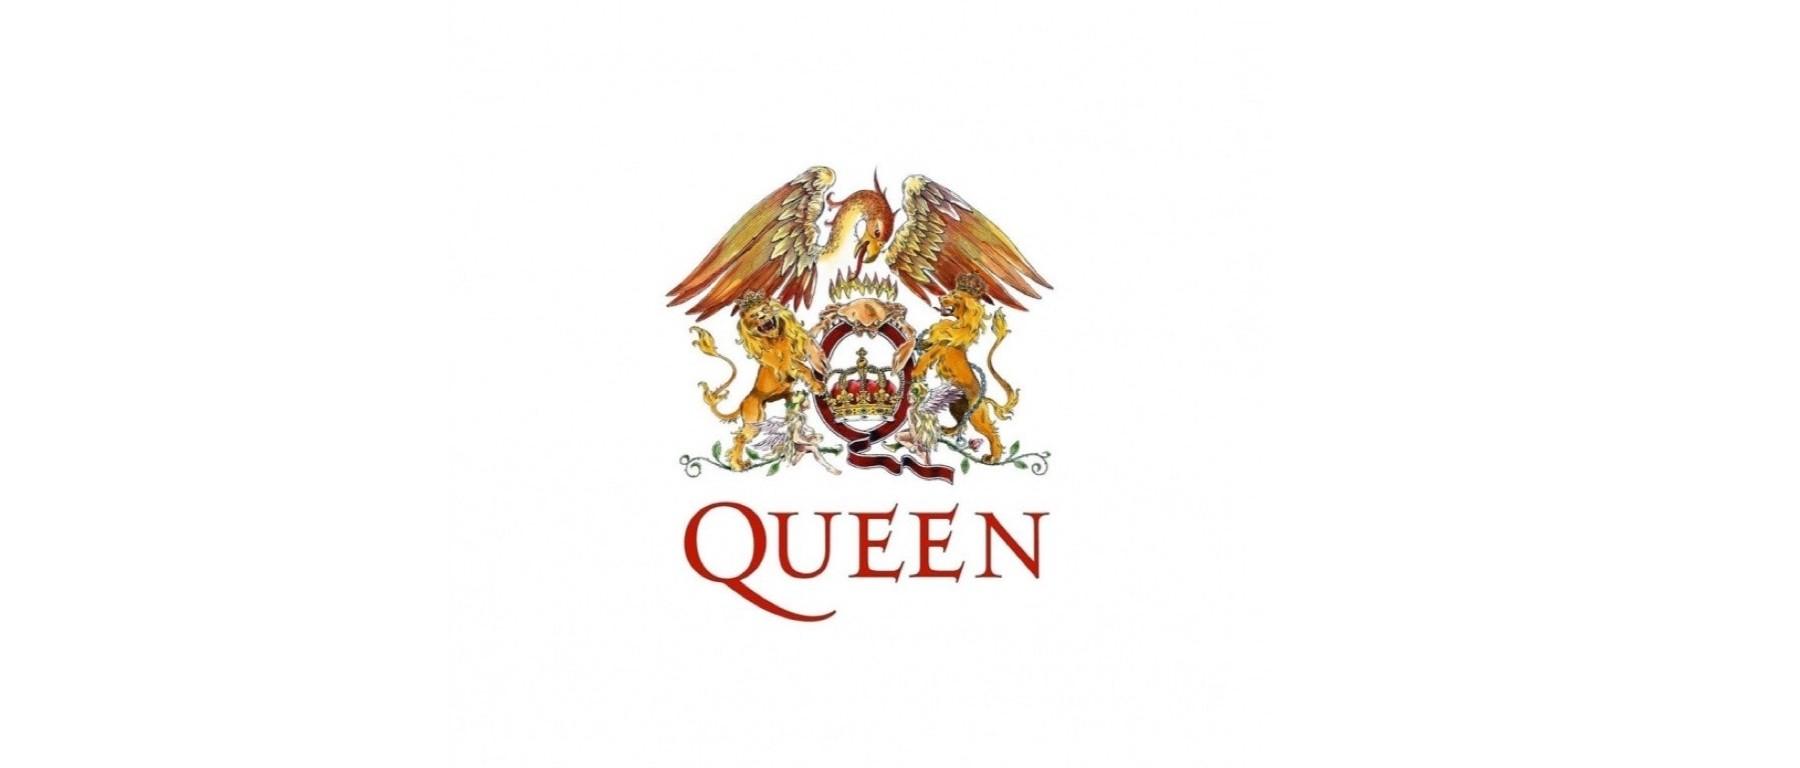 Queen's infamous band logo.